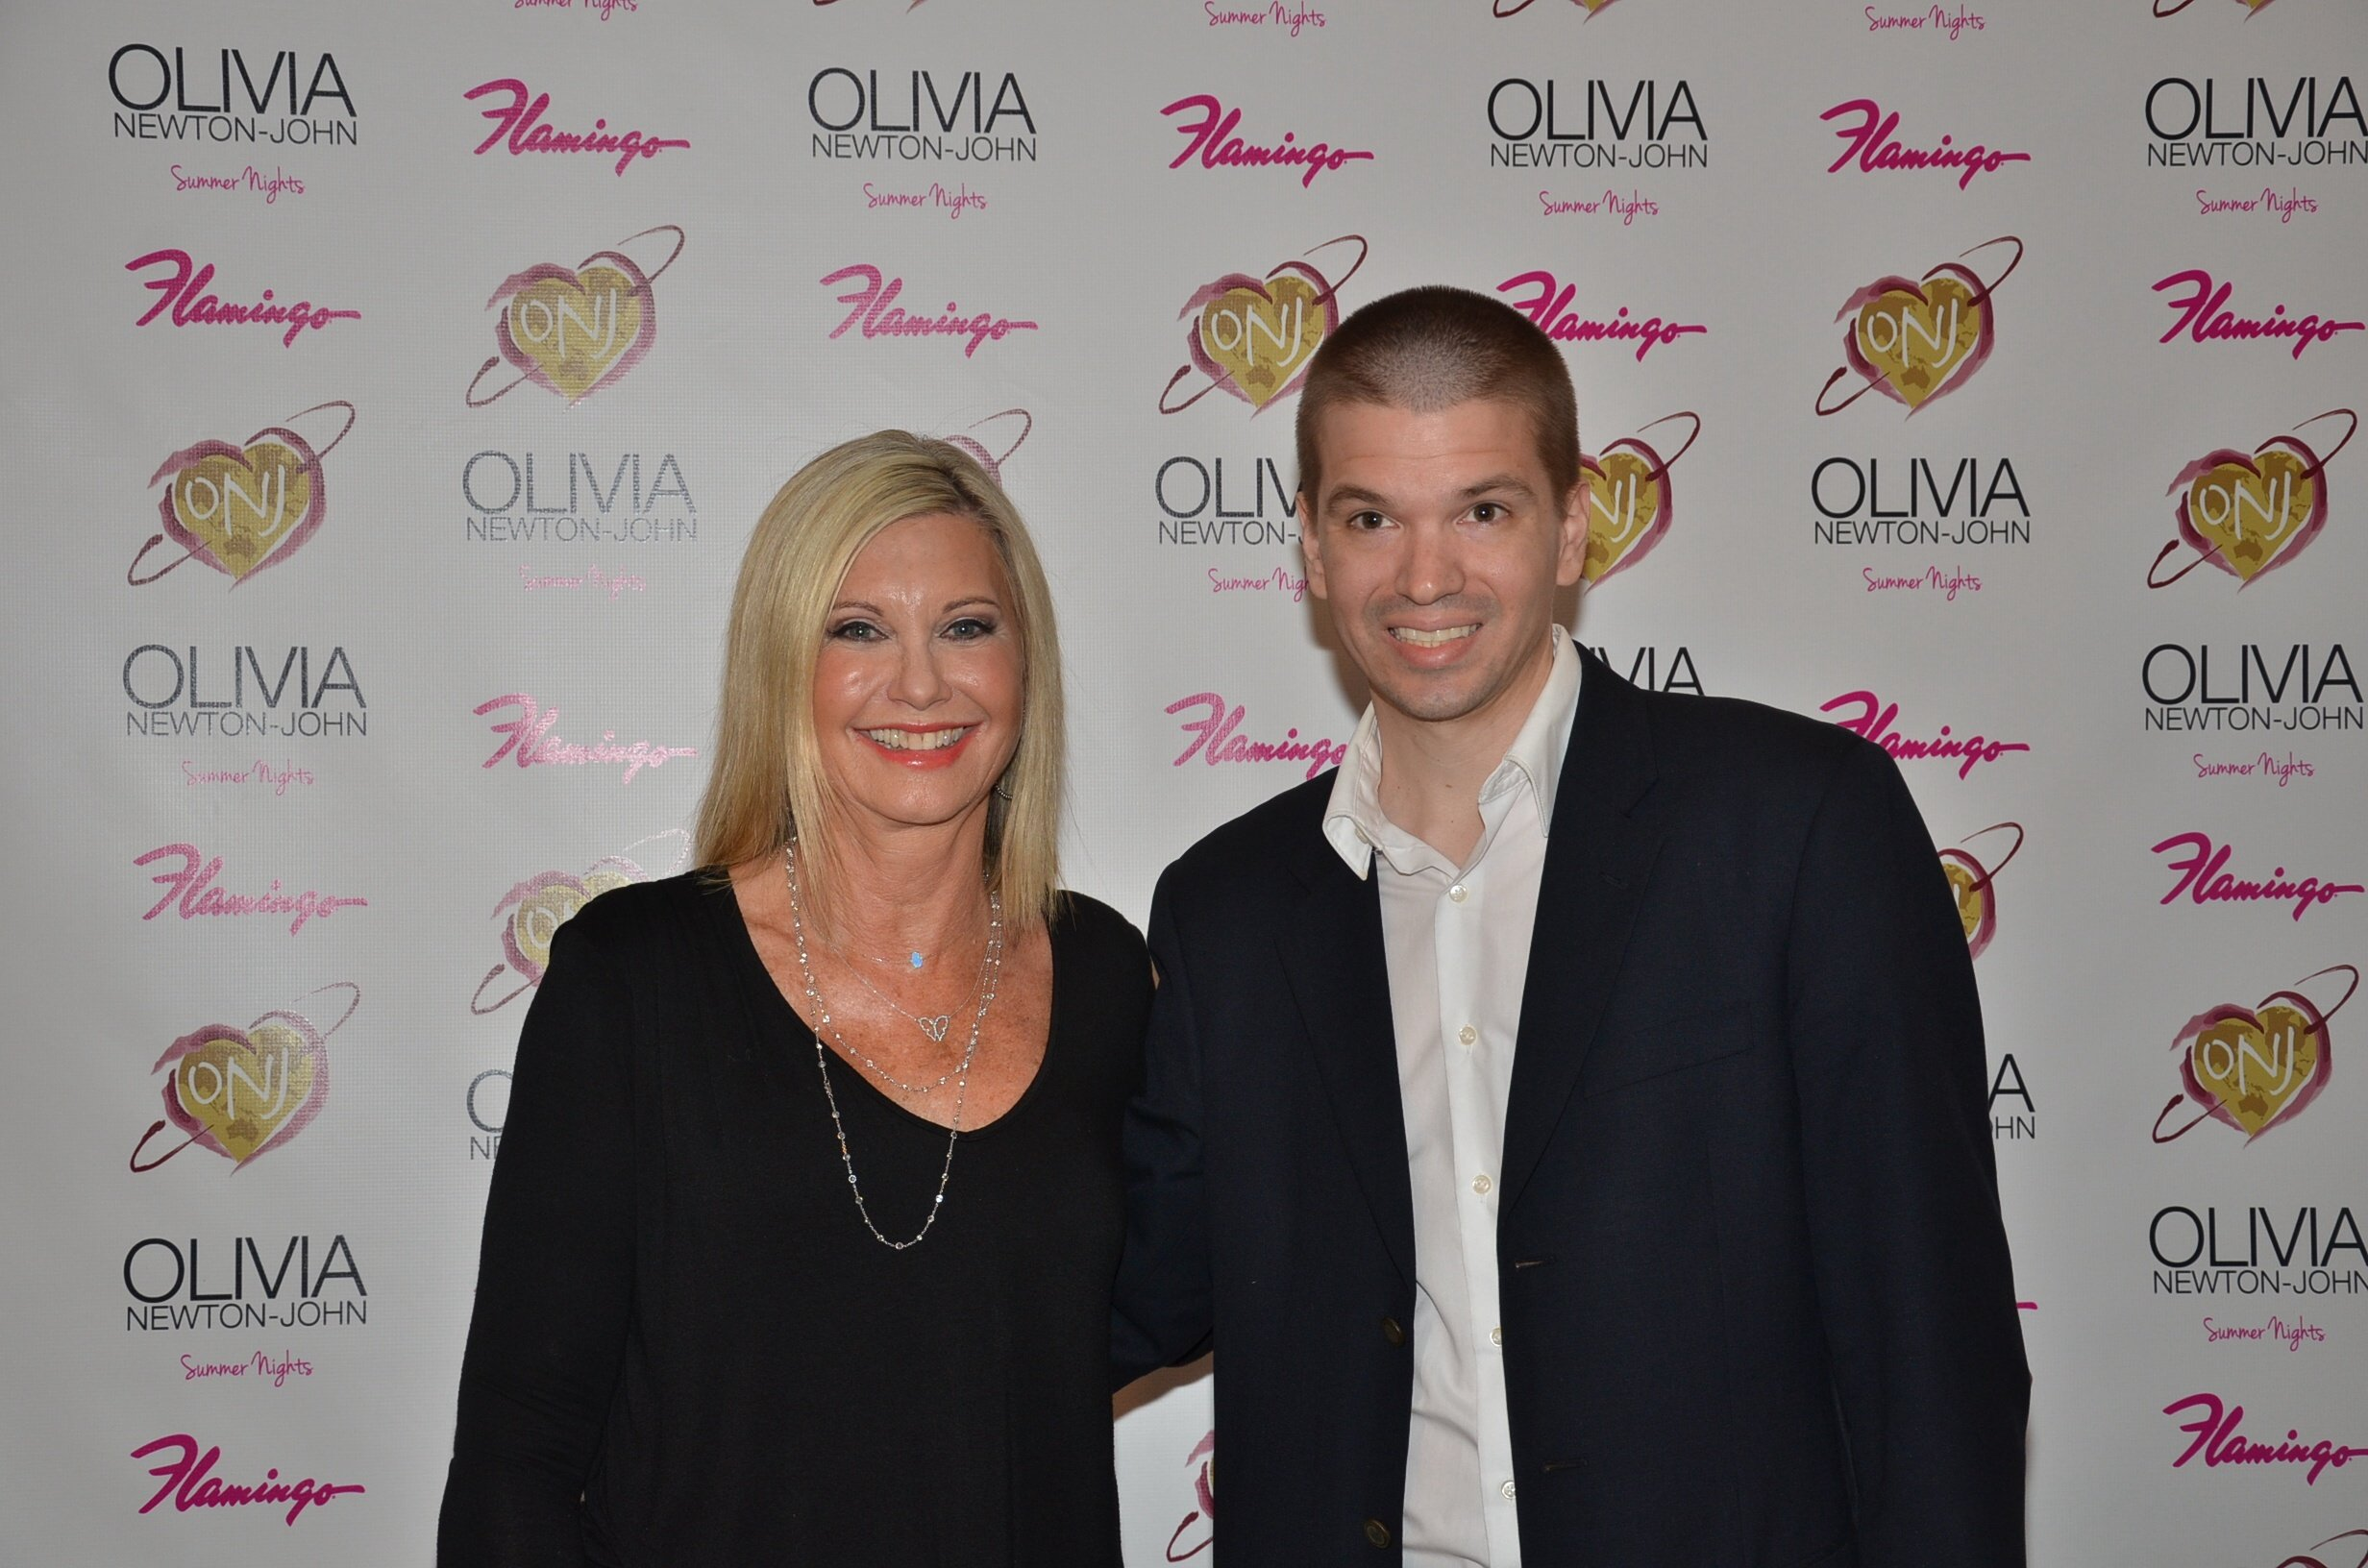 Chris Yandek. Olivia Newton-John